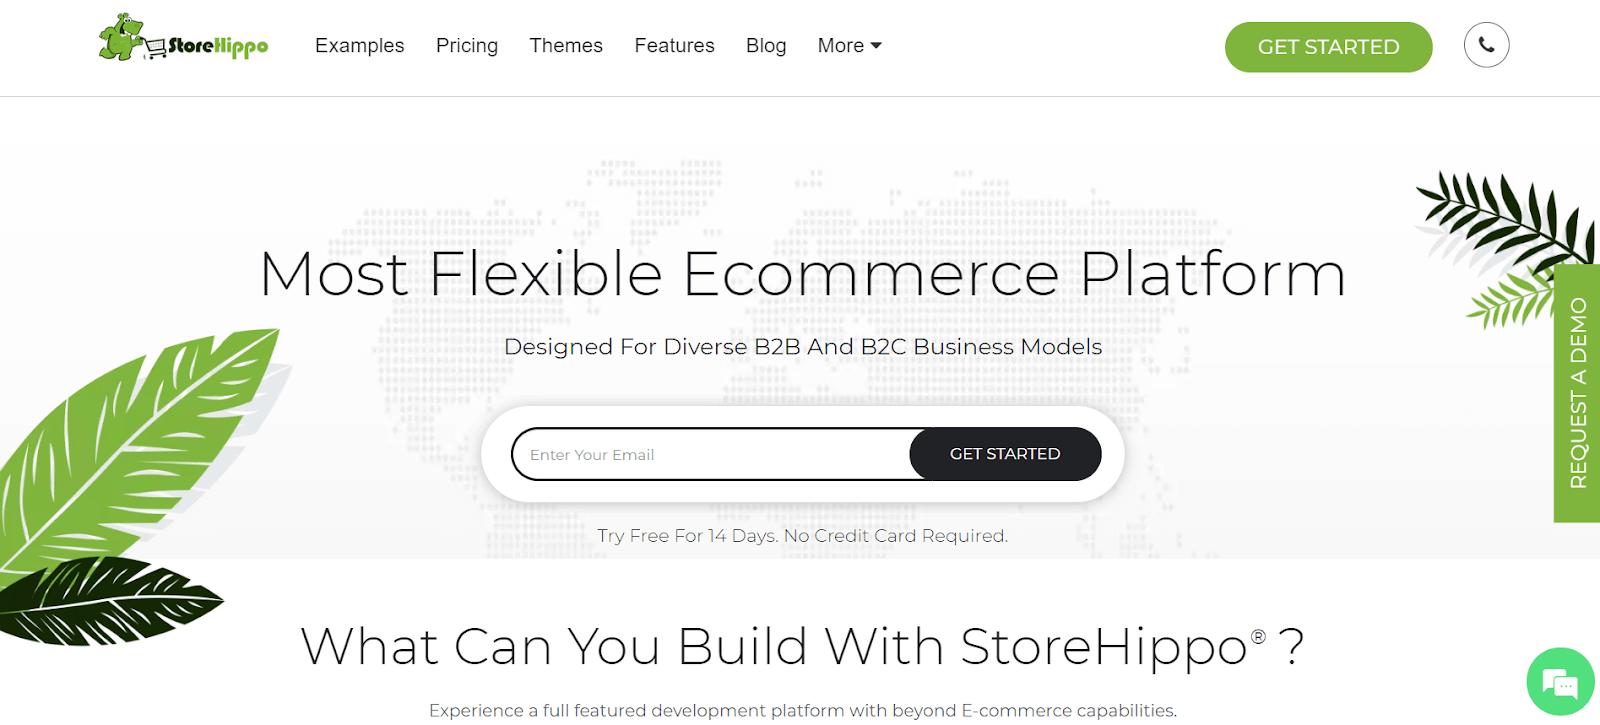 StoreHippo Ecommerce Platforms